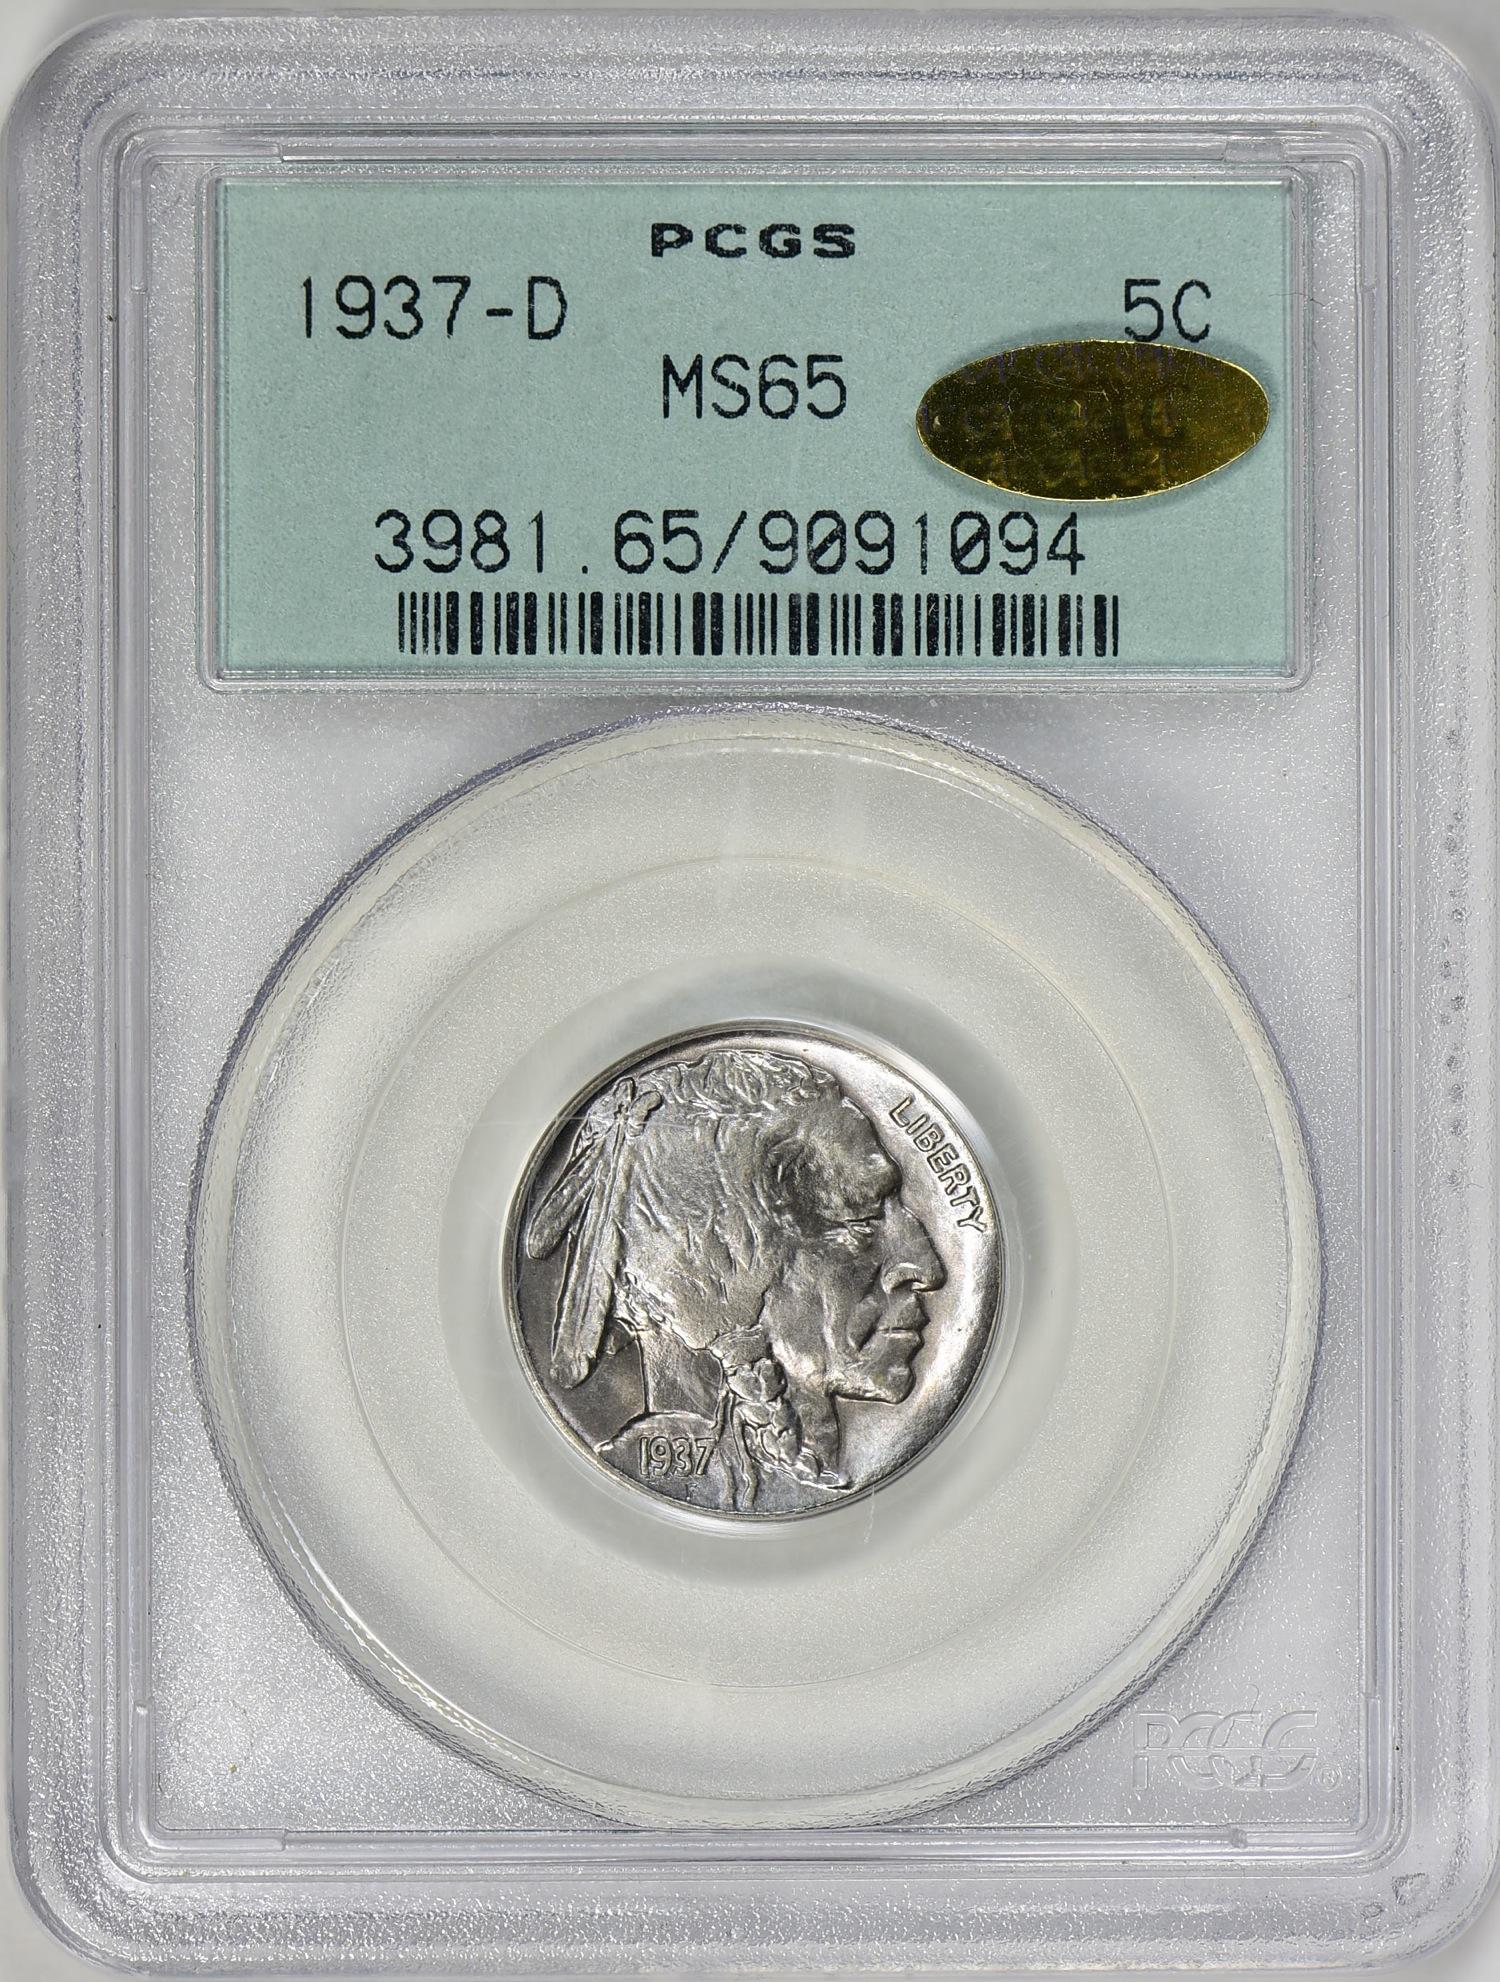 1937-D 9091094 Obverse MS65 CAC(Gold).jpg